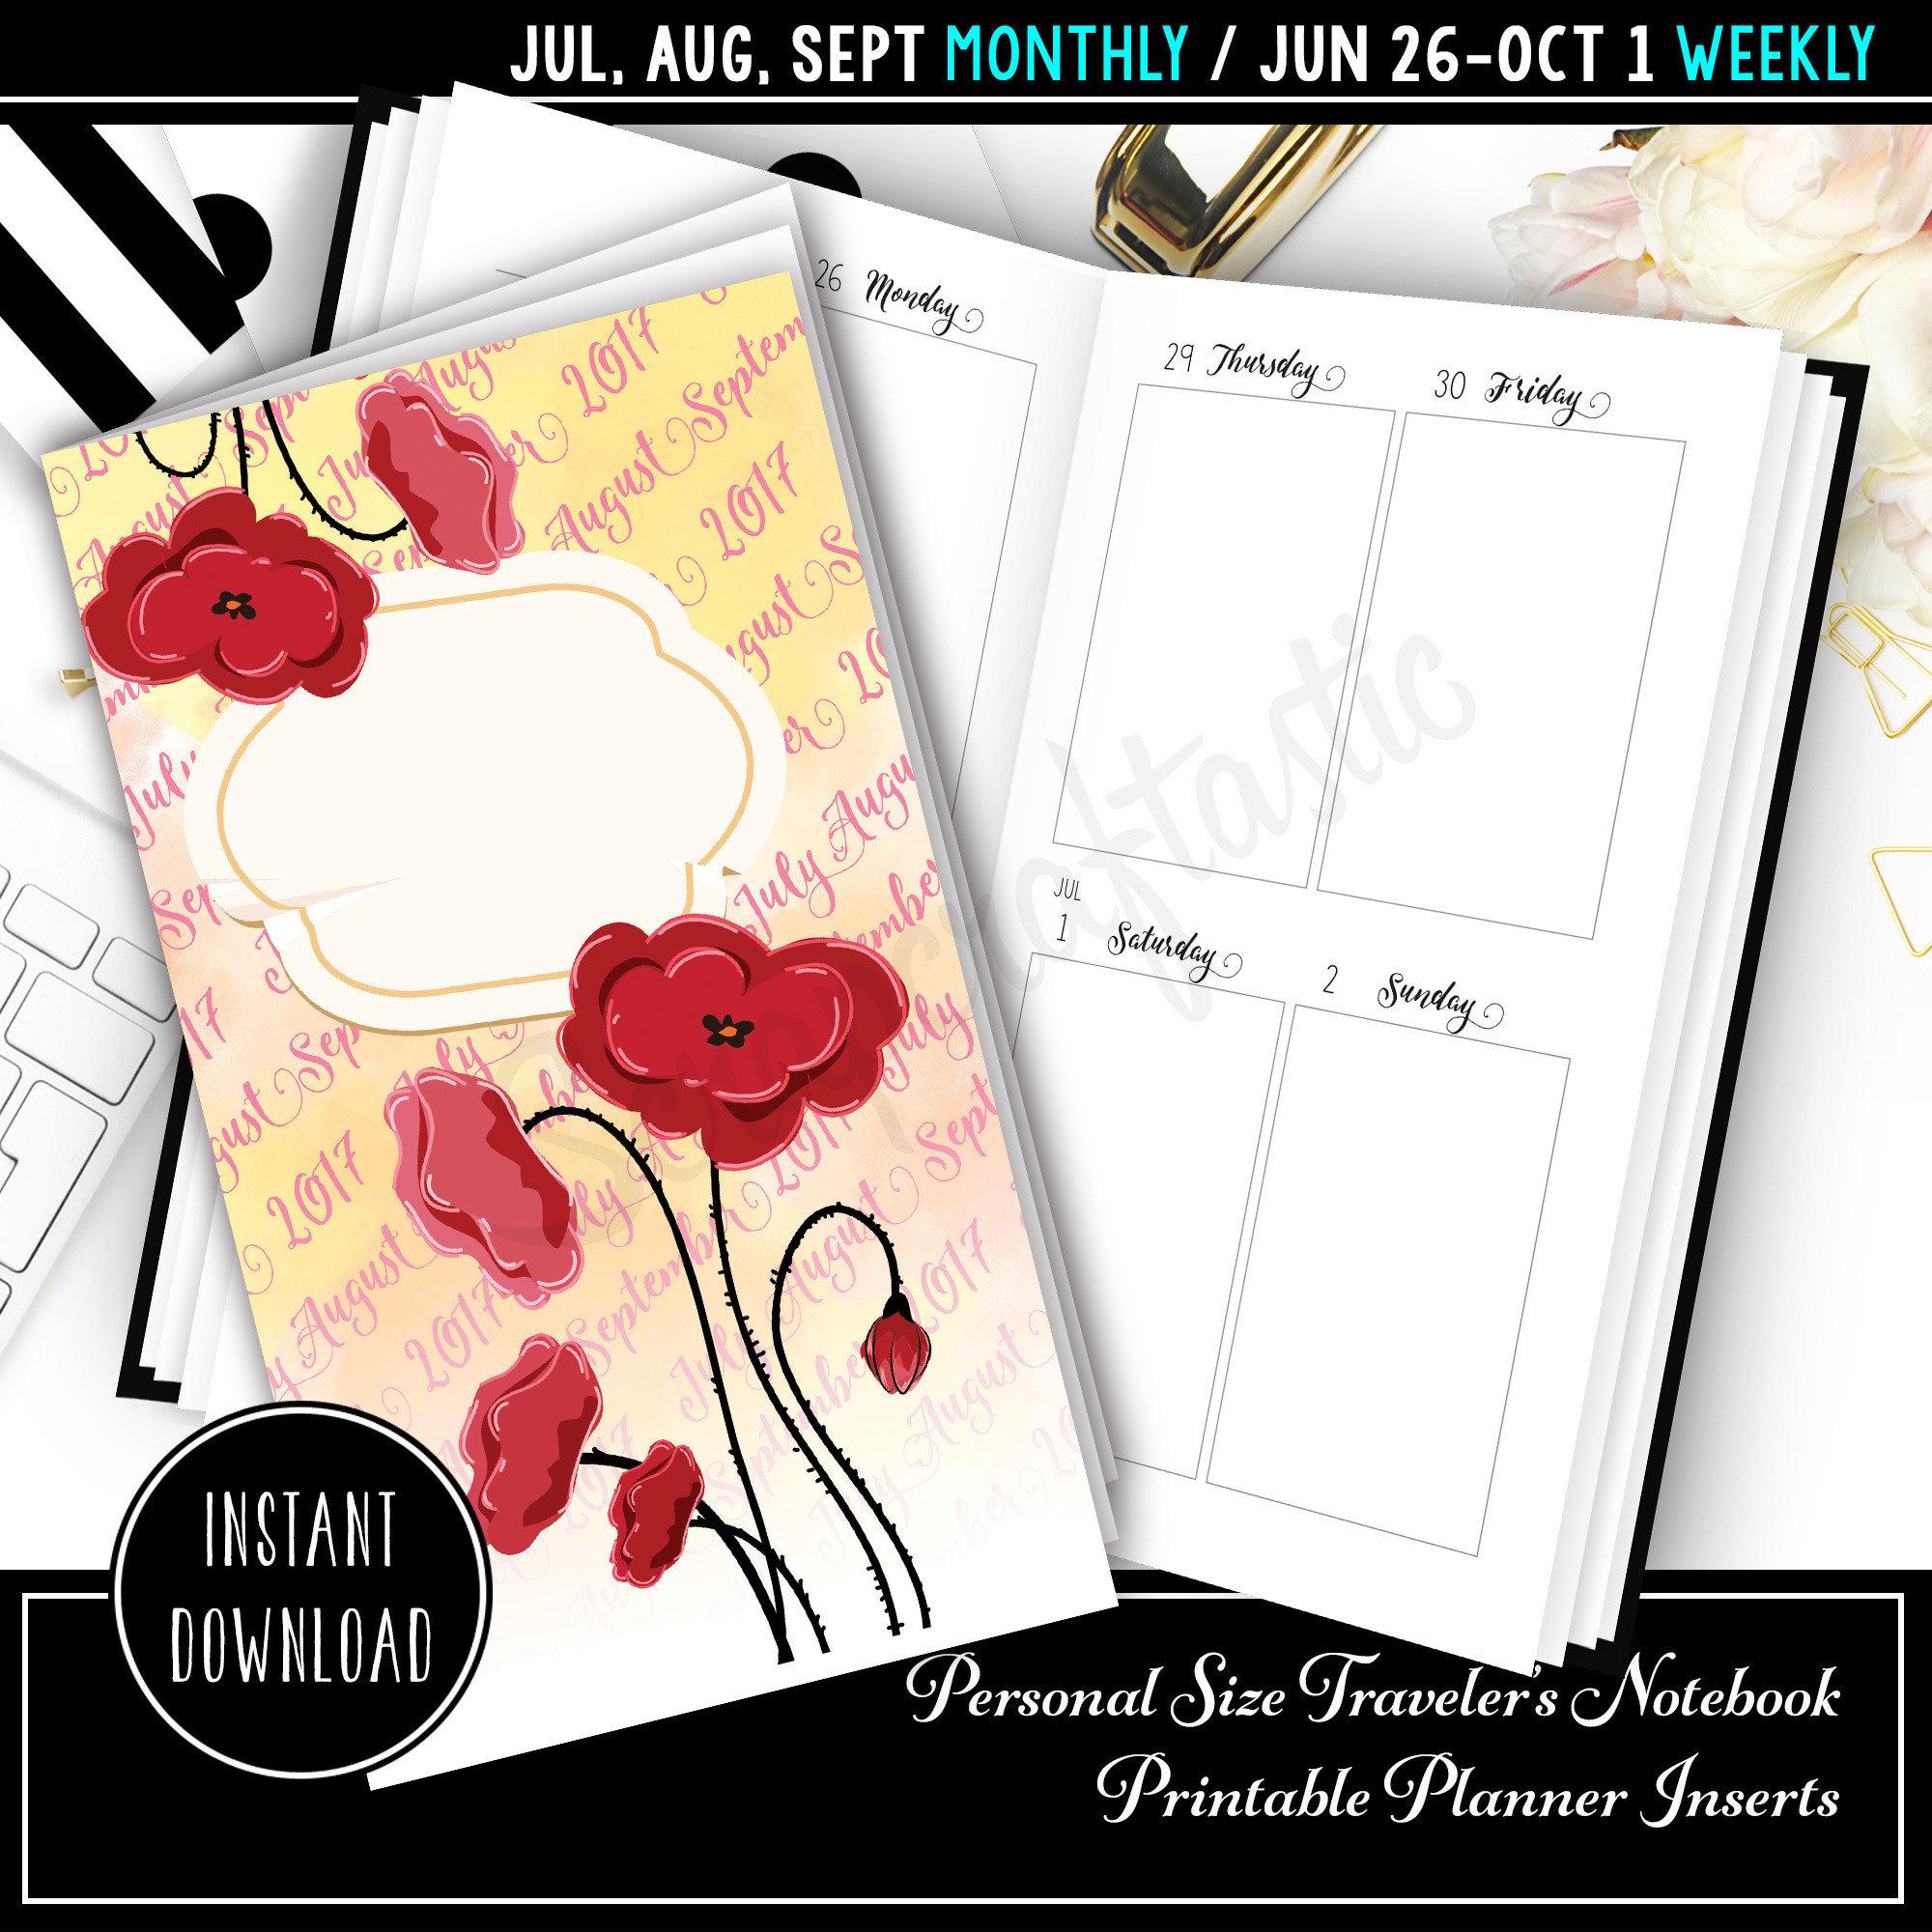 Jul-Sep 2017 Personal Traveler's Notebook Printable Planner Inserts 09001